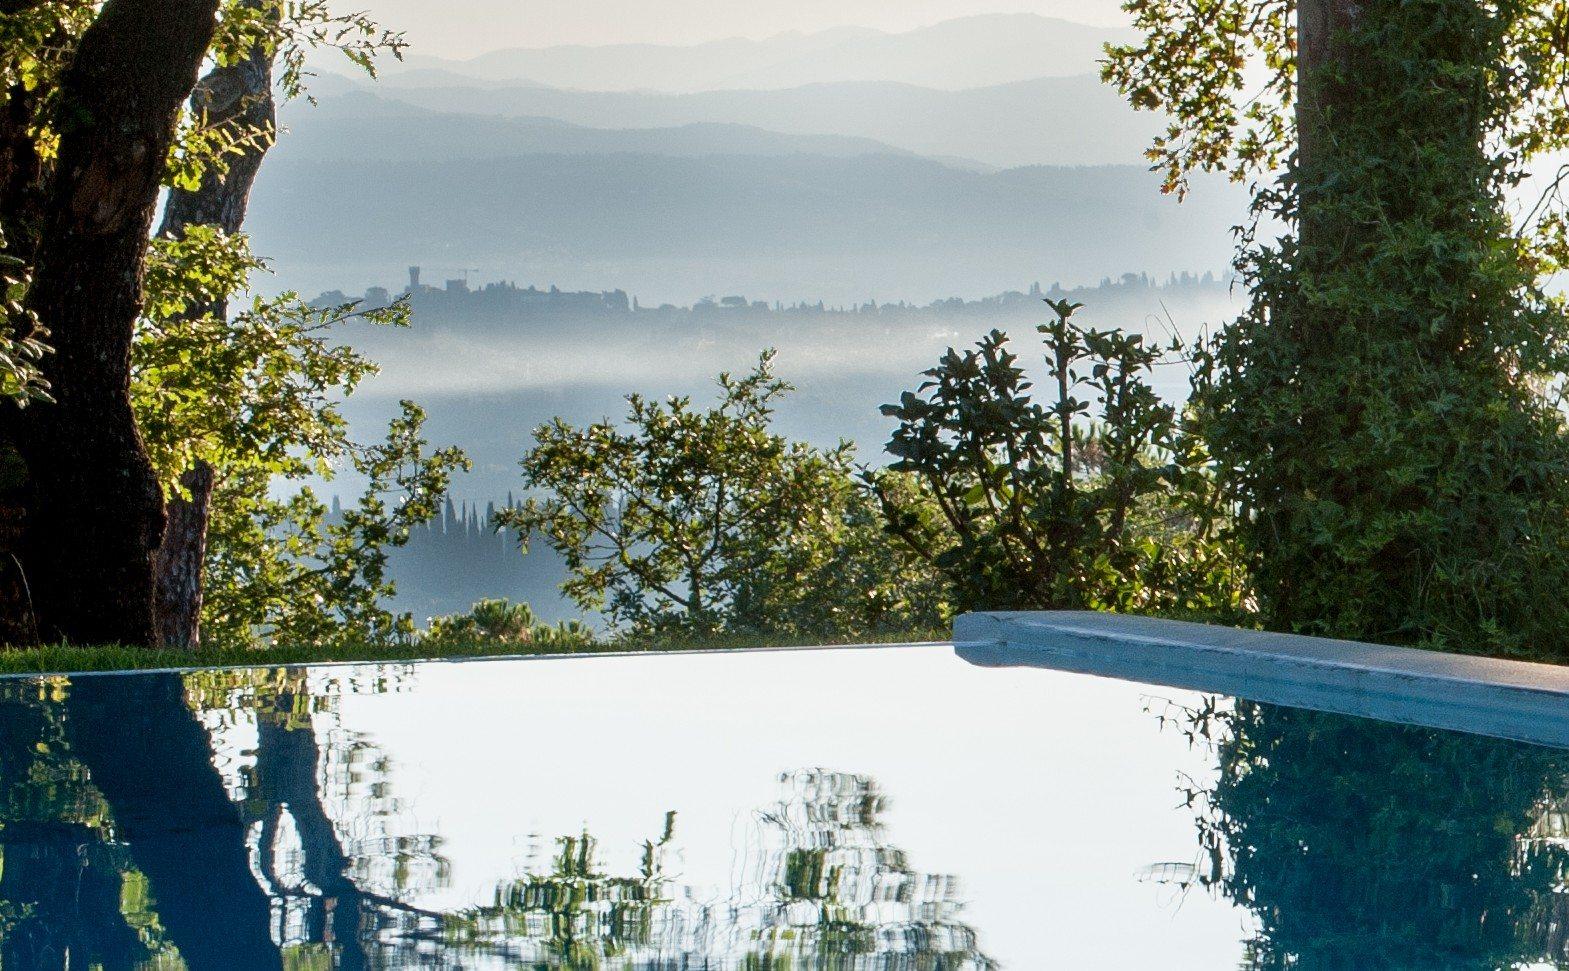 UltraVilla-The-Best-In-Italy-Villa-Tavernaccia-Infinity-Pool